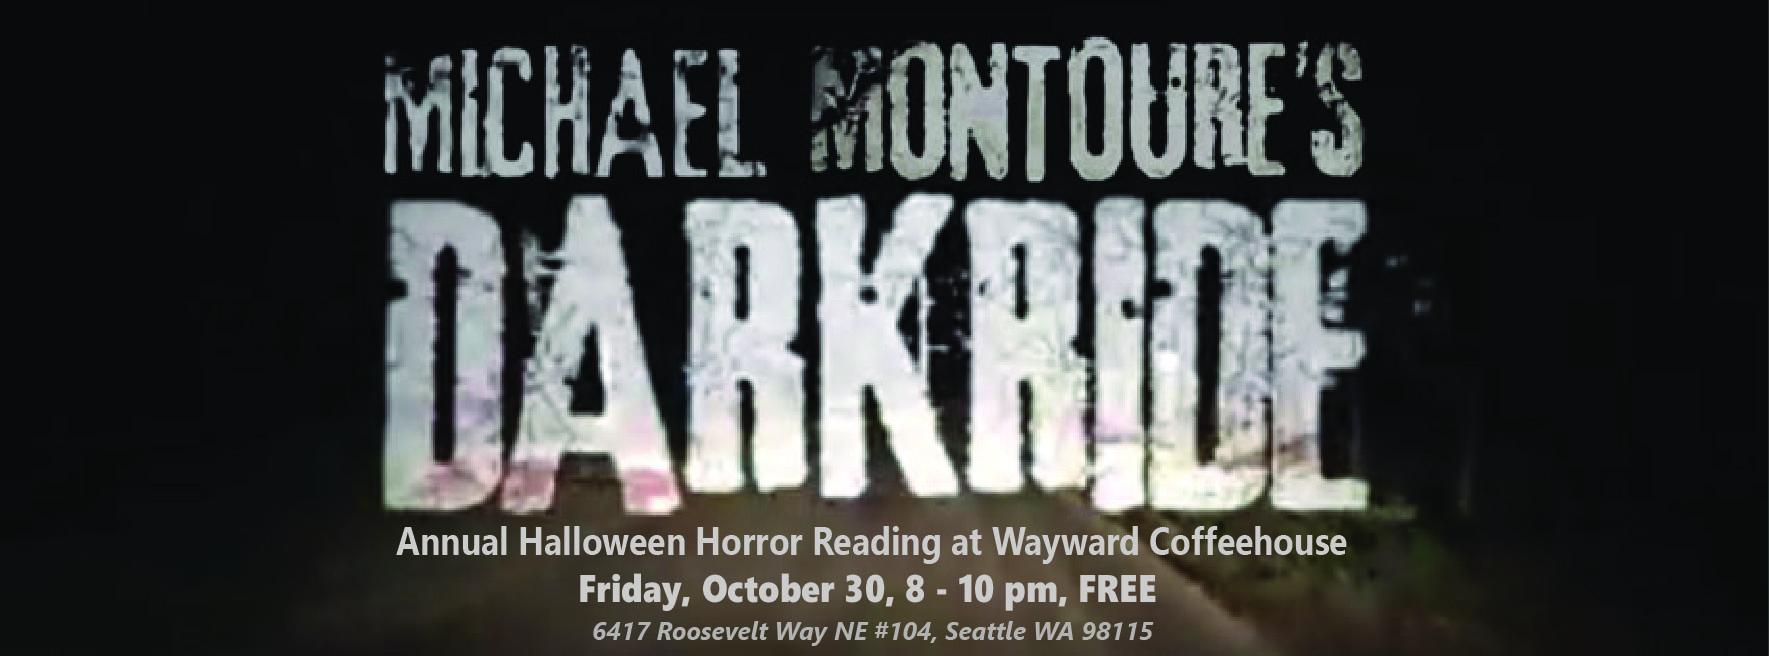 FB Banner - Halloween Horror Reading 2015-1021